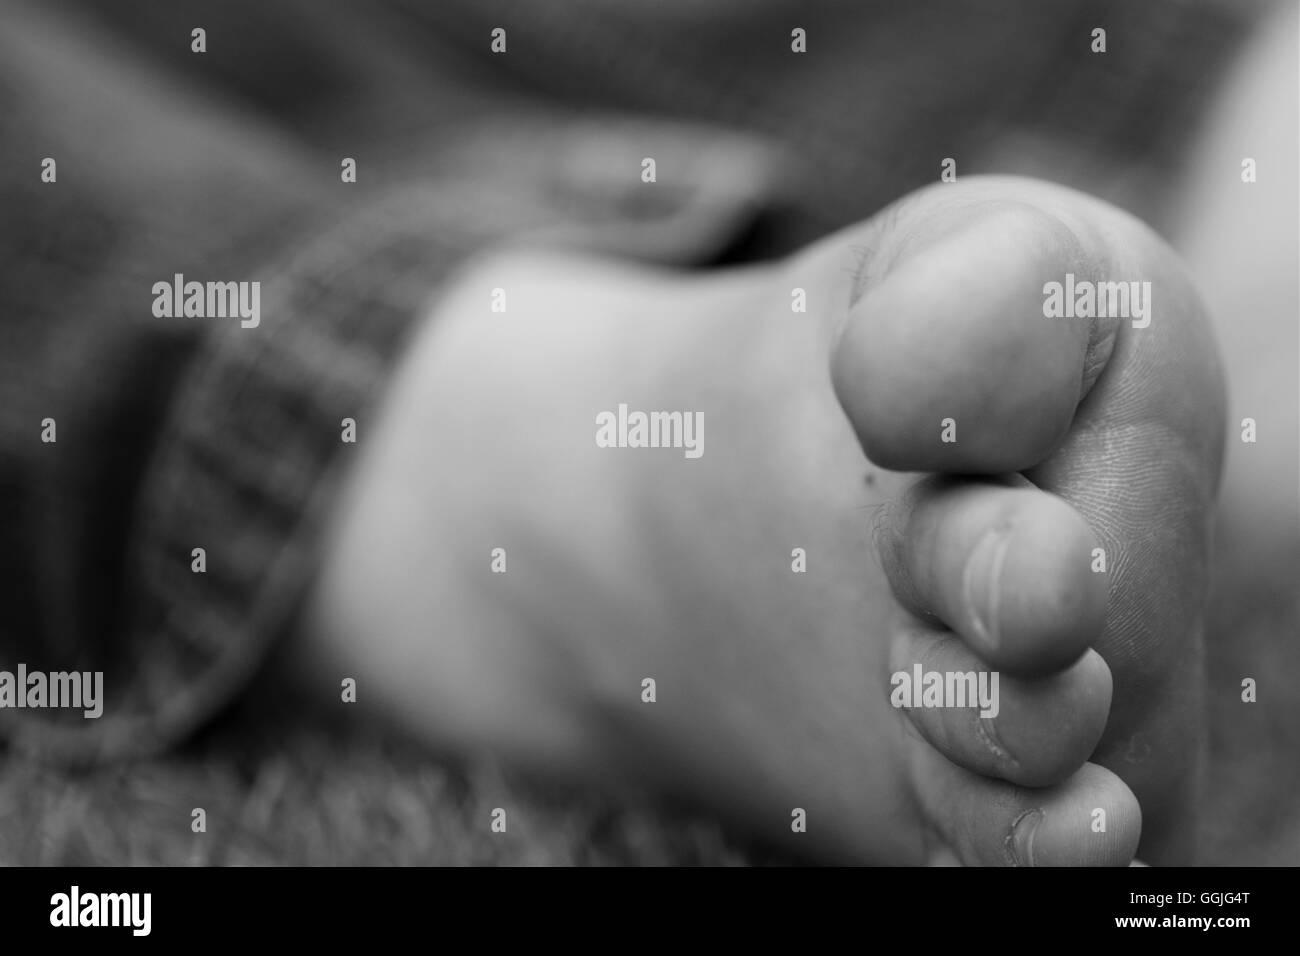 Closeup of toes. - Stock Image